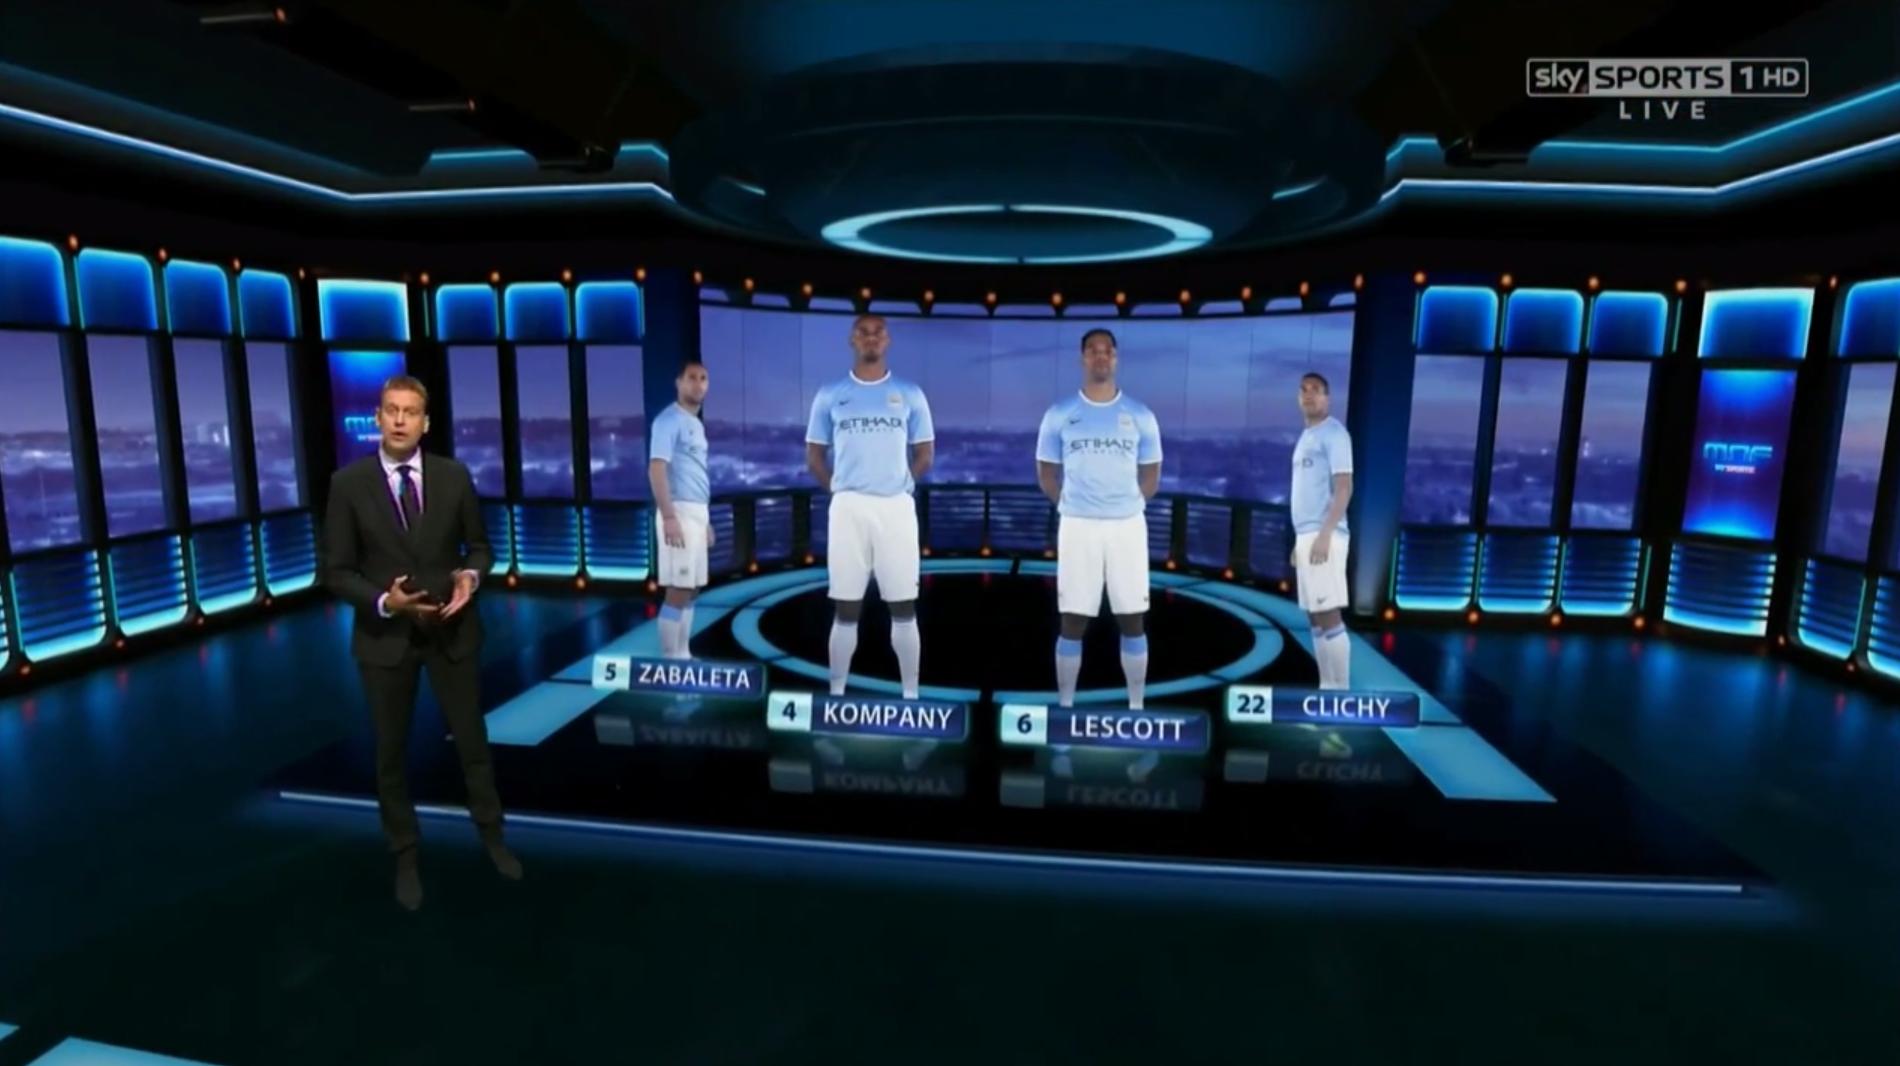 Viz Virtual Studio - Sky Sports virtual set - Vizrt global